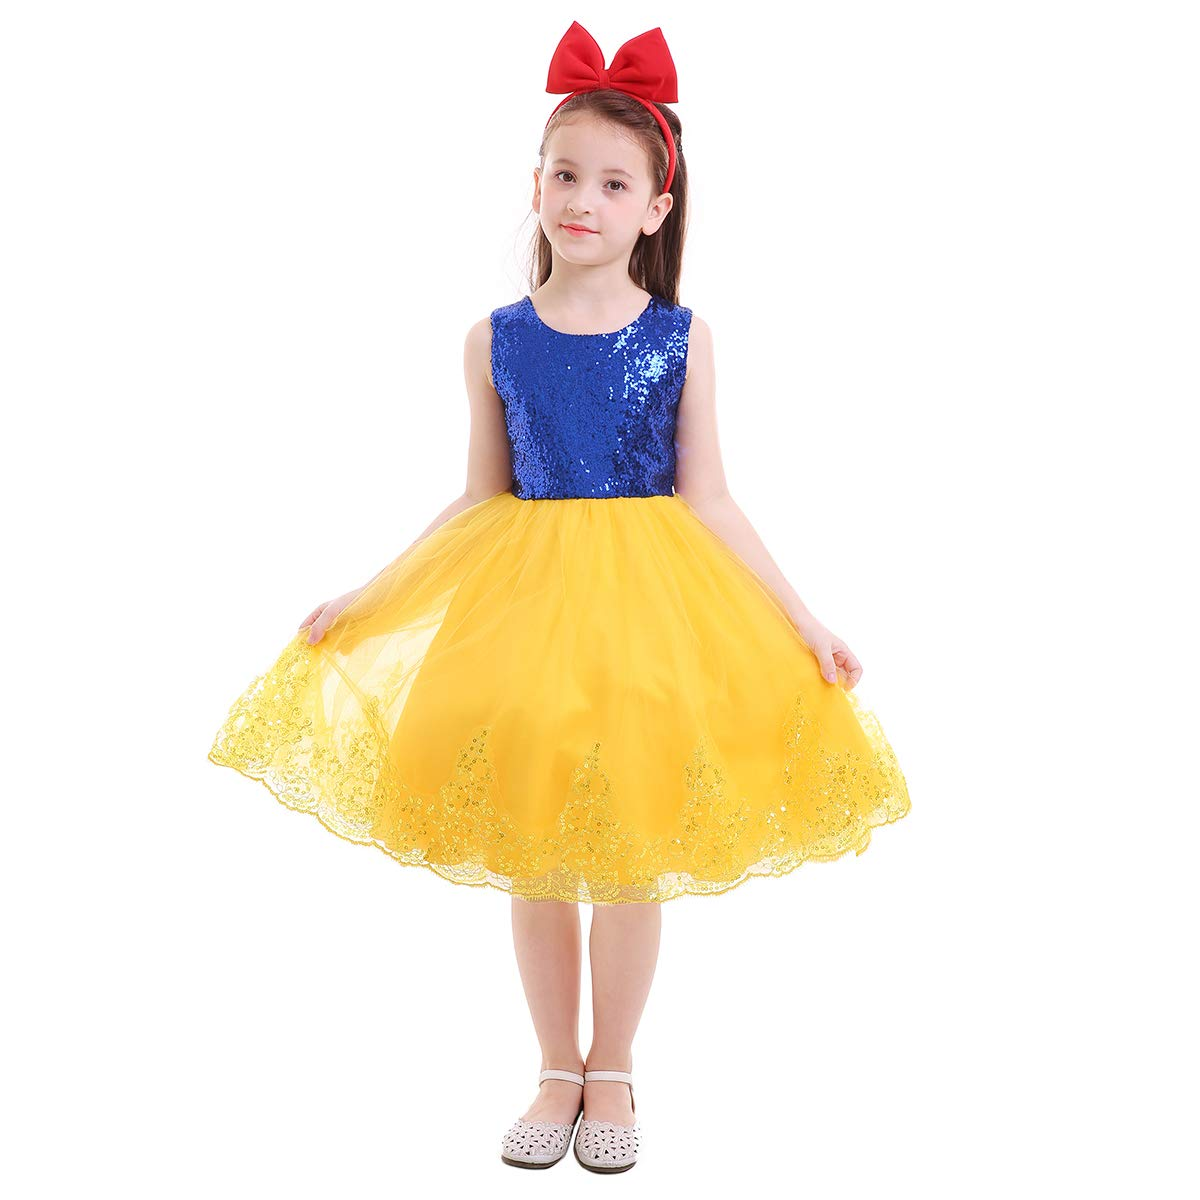 4c1214f0eba1e Amazon.com: IMEKIS Snow White Princess Costume Sequin Halloween ...